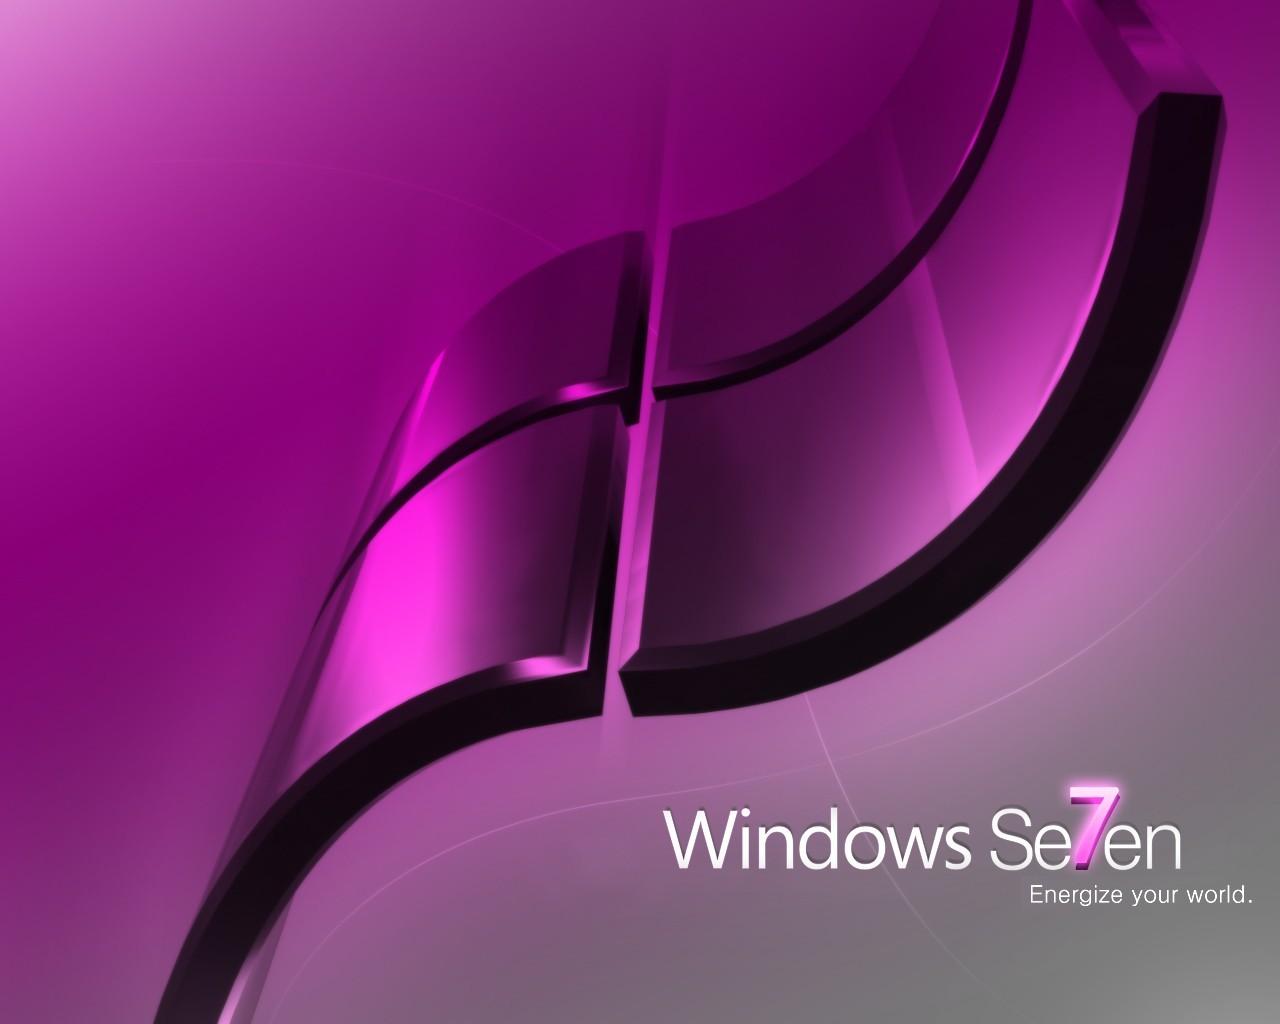 wallpaper windows 7 11   codRosuro 1280x1024